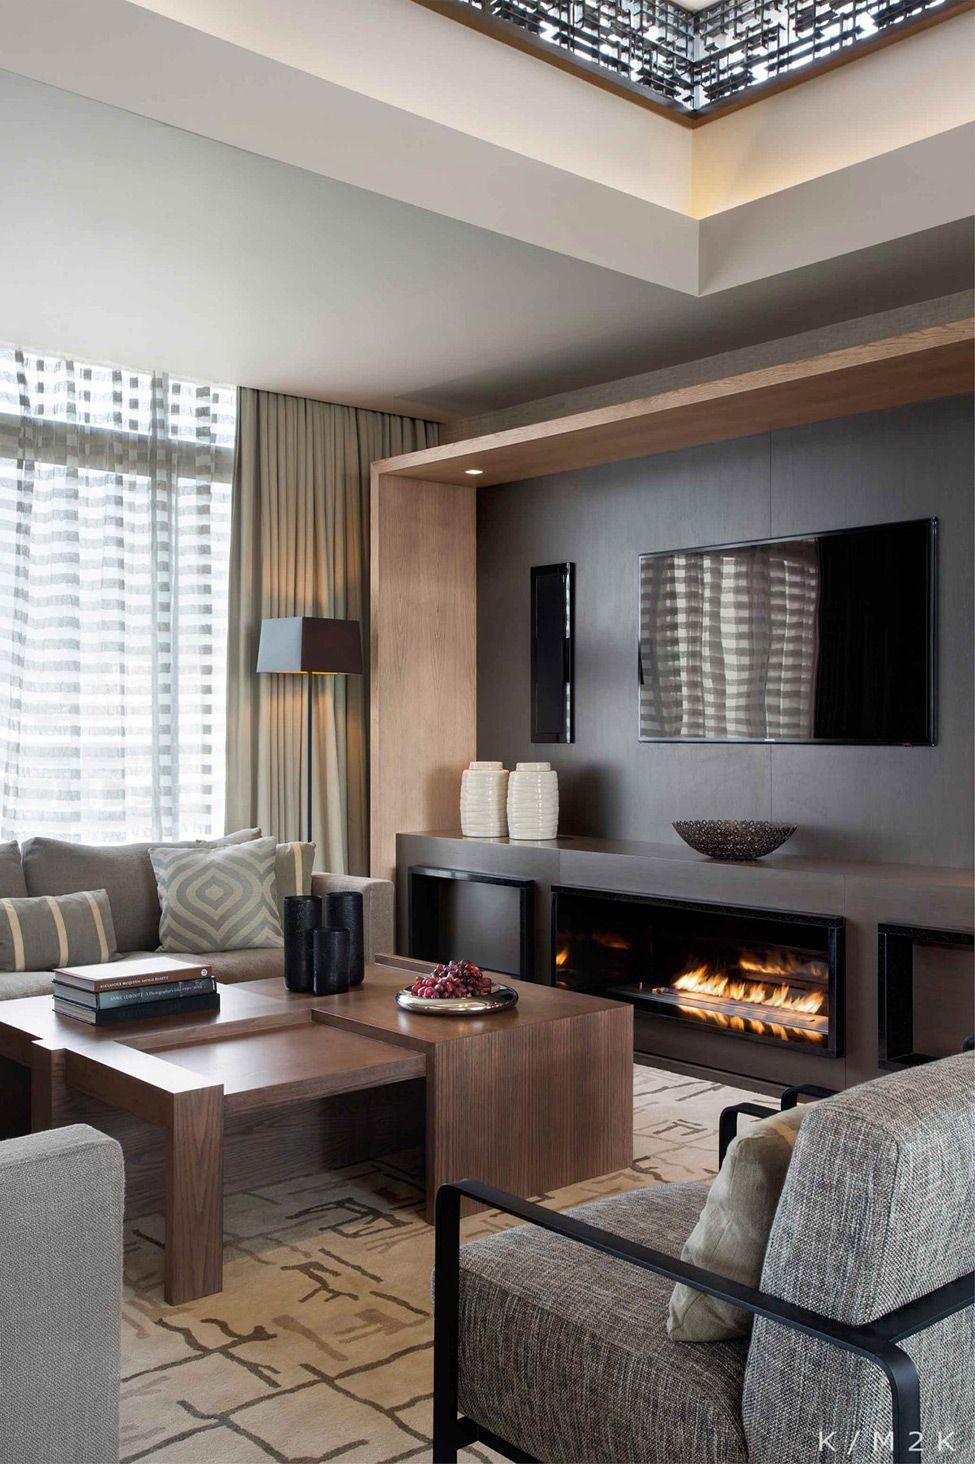 Keith Interior Design & M2K Architecture